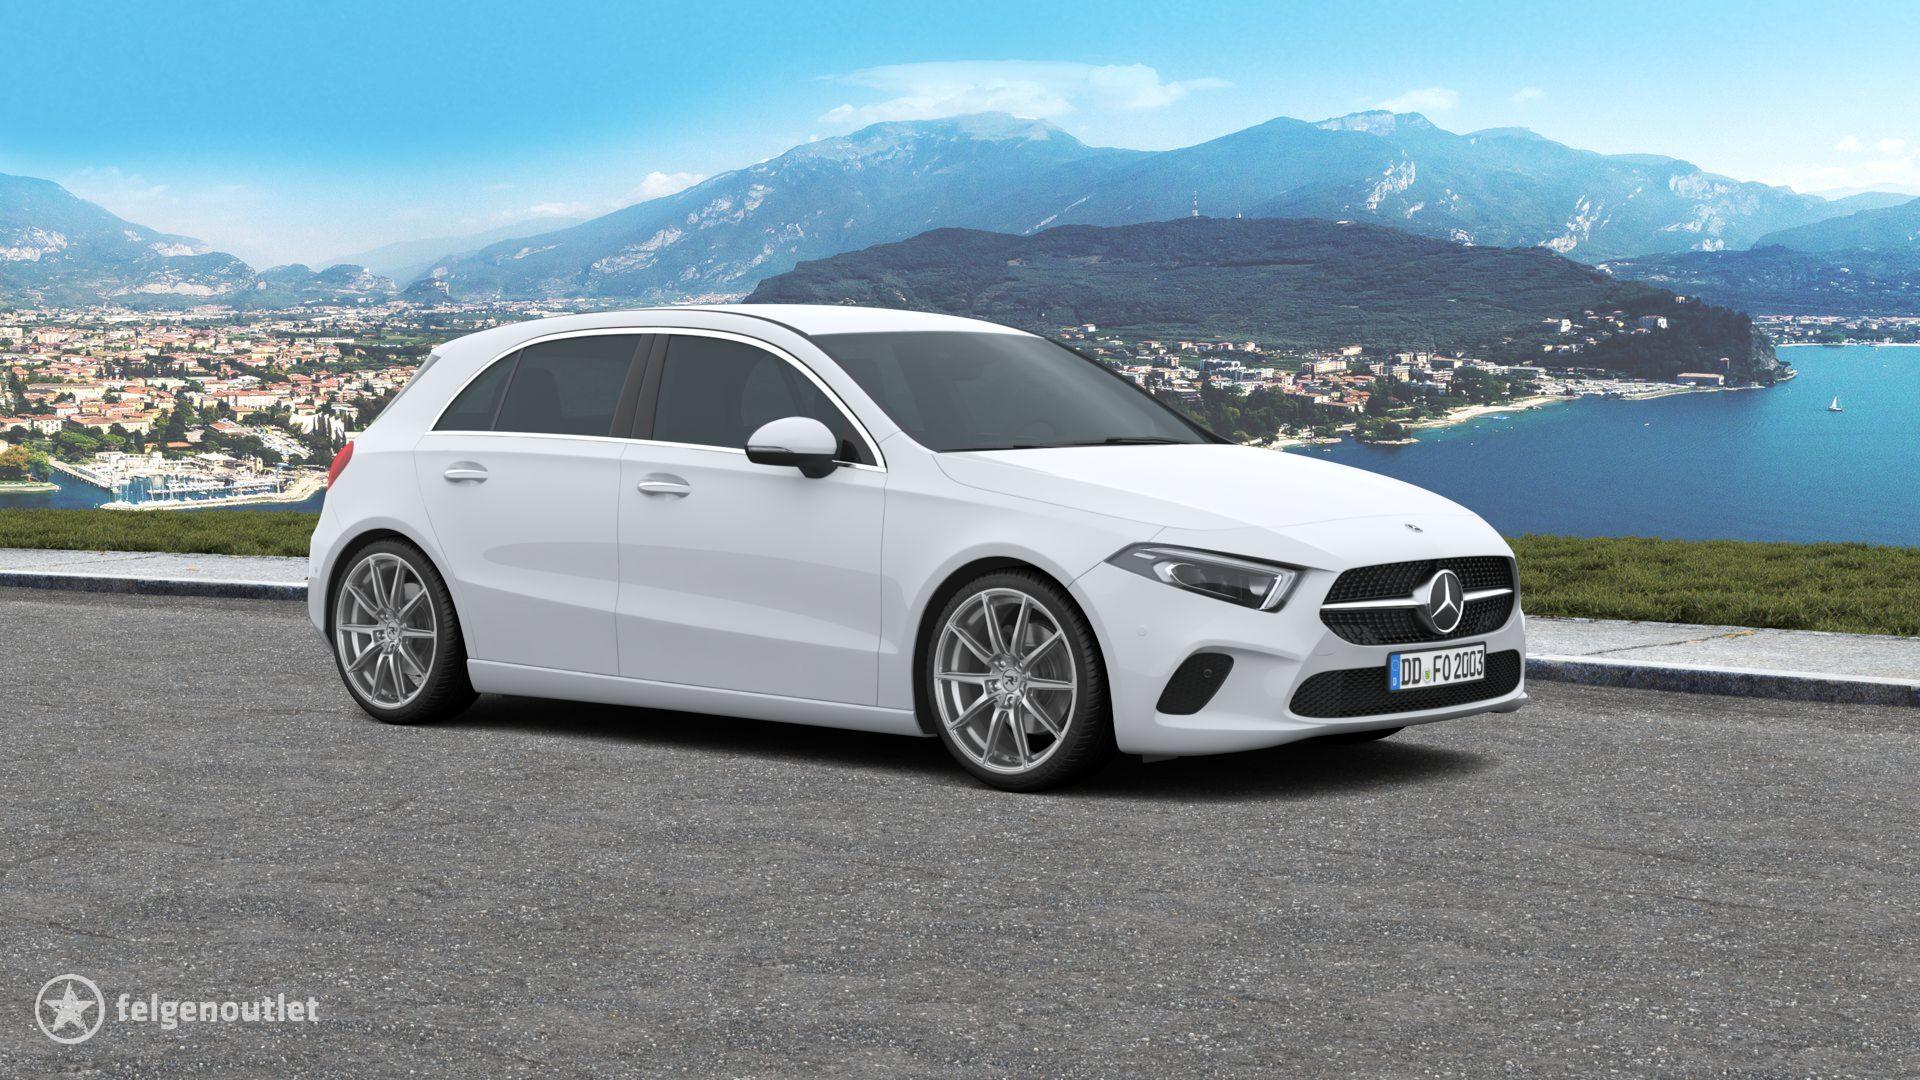 R3 Wheels R3H03 anthracite-matt Mercedes Benz A-Klasse Kompaktklasse